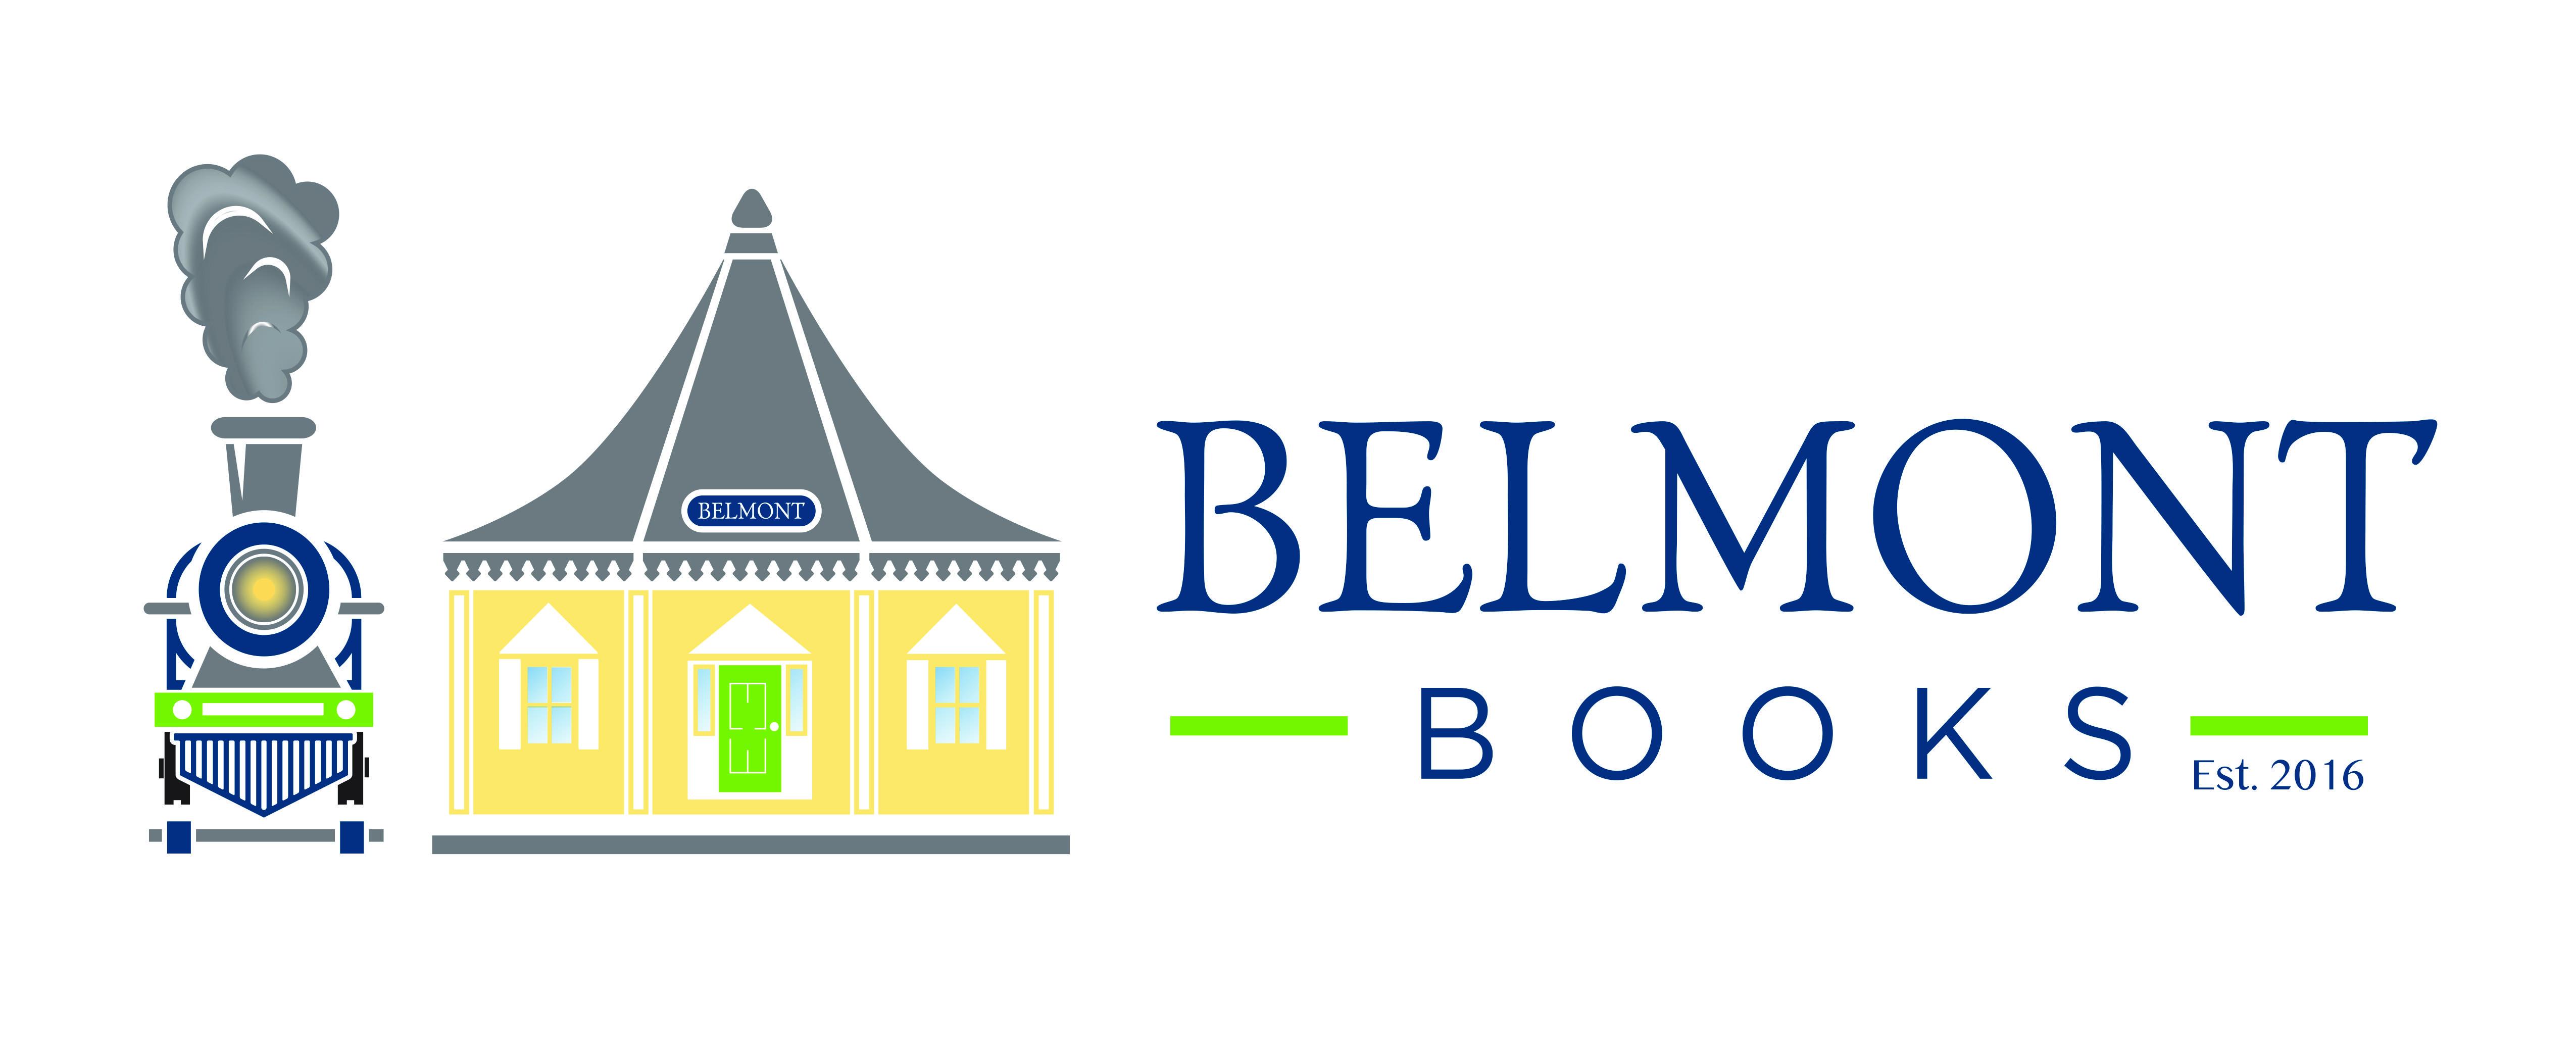 Belmont Books